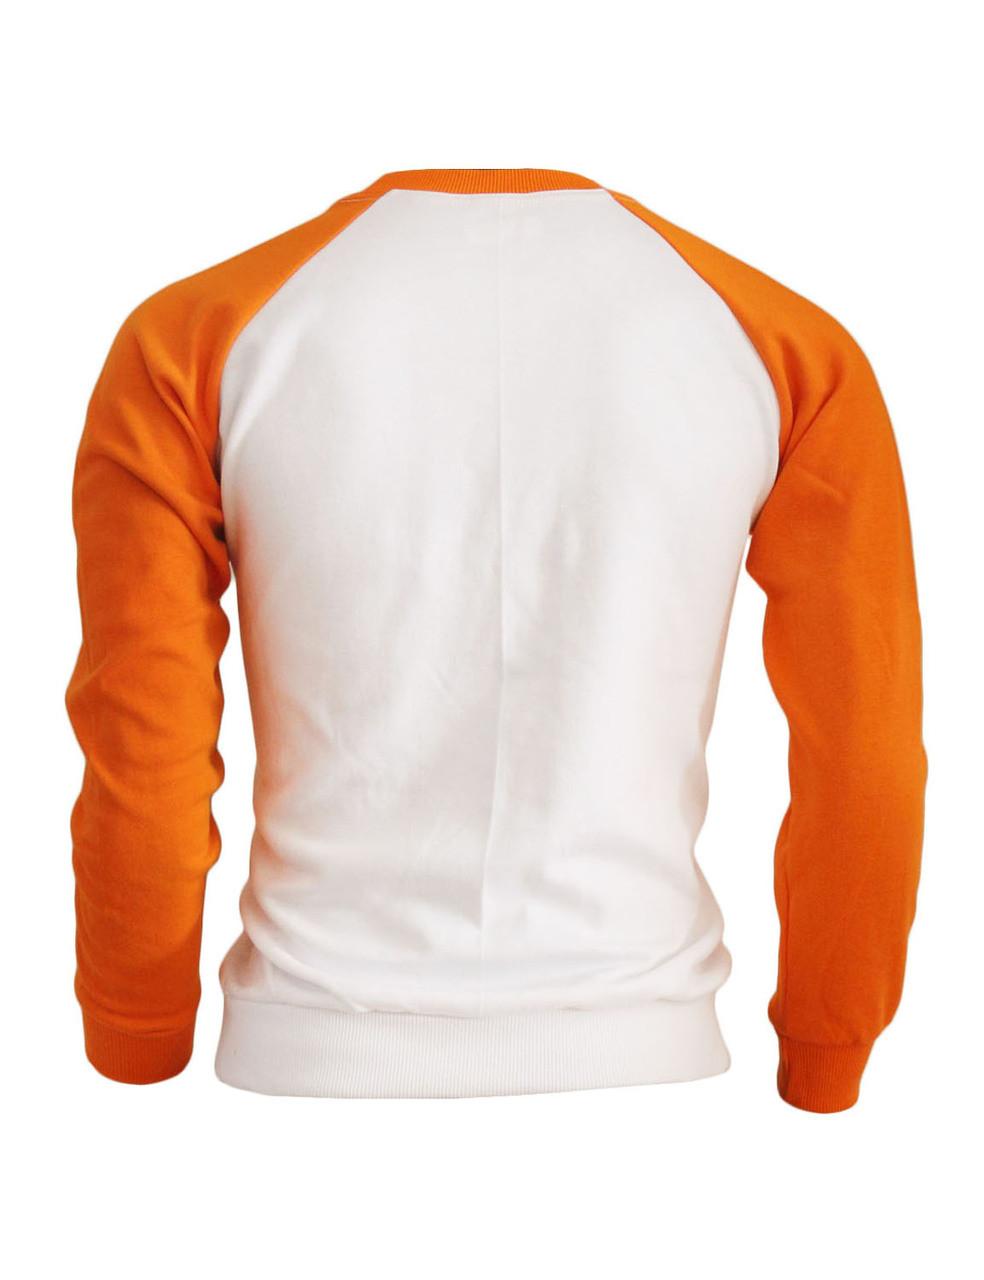 80749586 BCPOLO Men's Casual raglan 2 tone color t-shirt sportswear fashion crew  neck cotton shirt.-orange ...